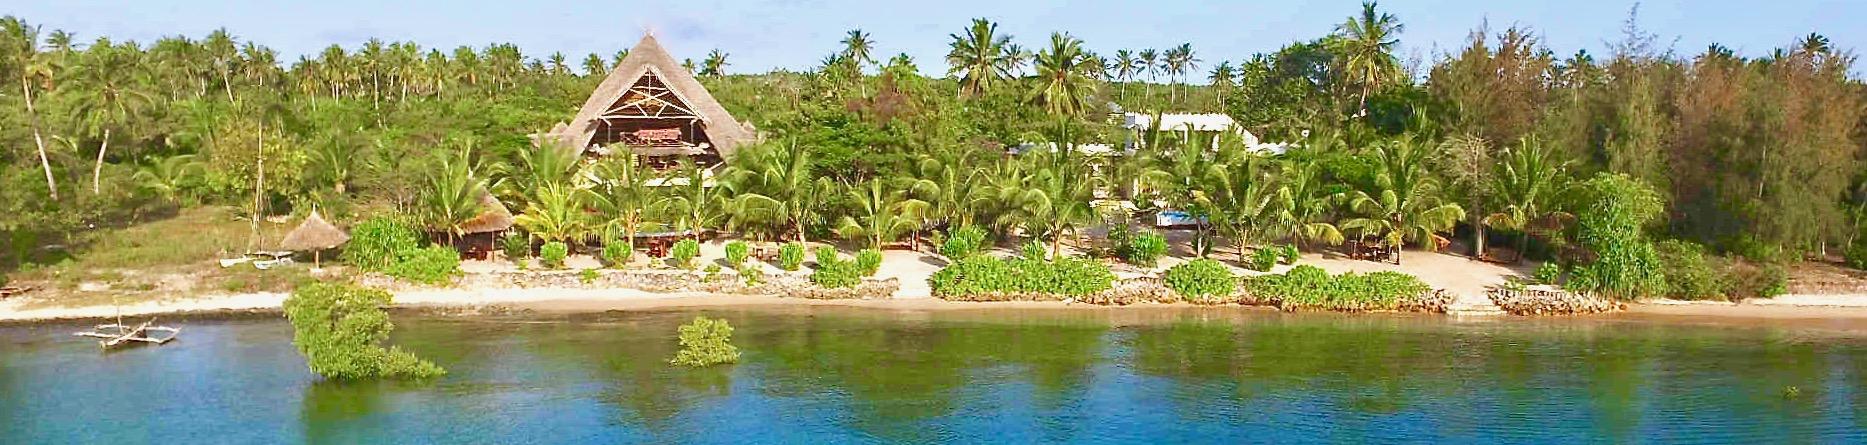 Zanzibar Villas From The Ocean 2